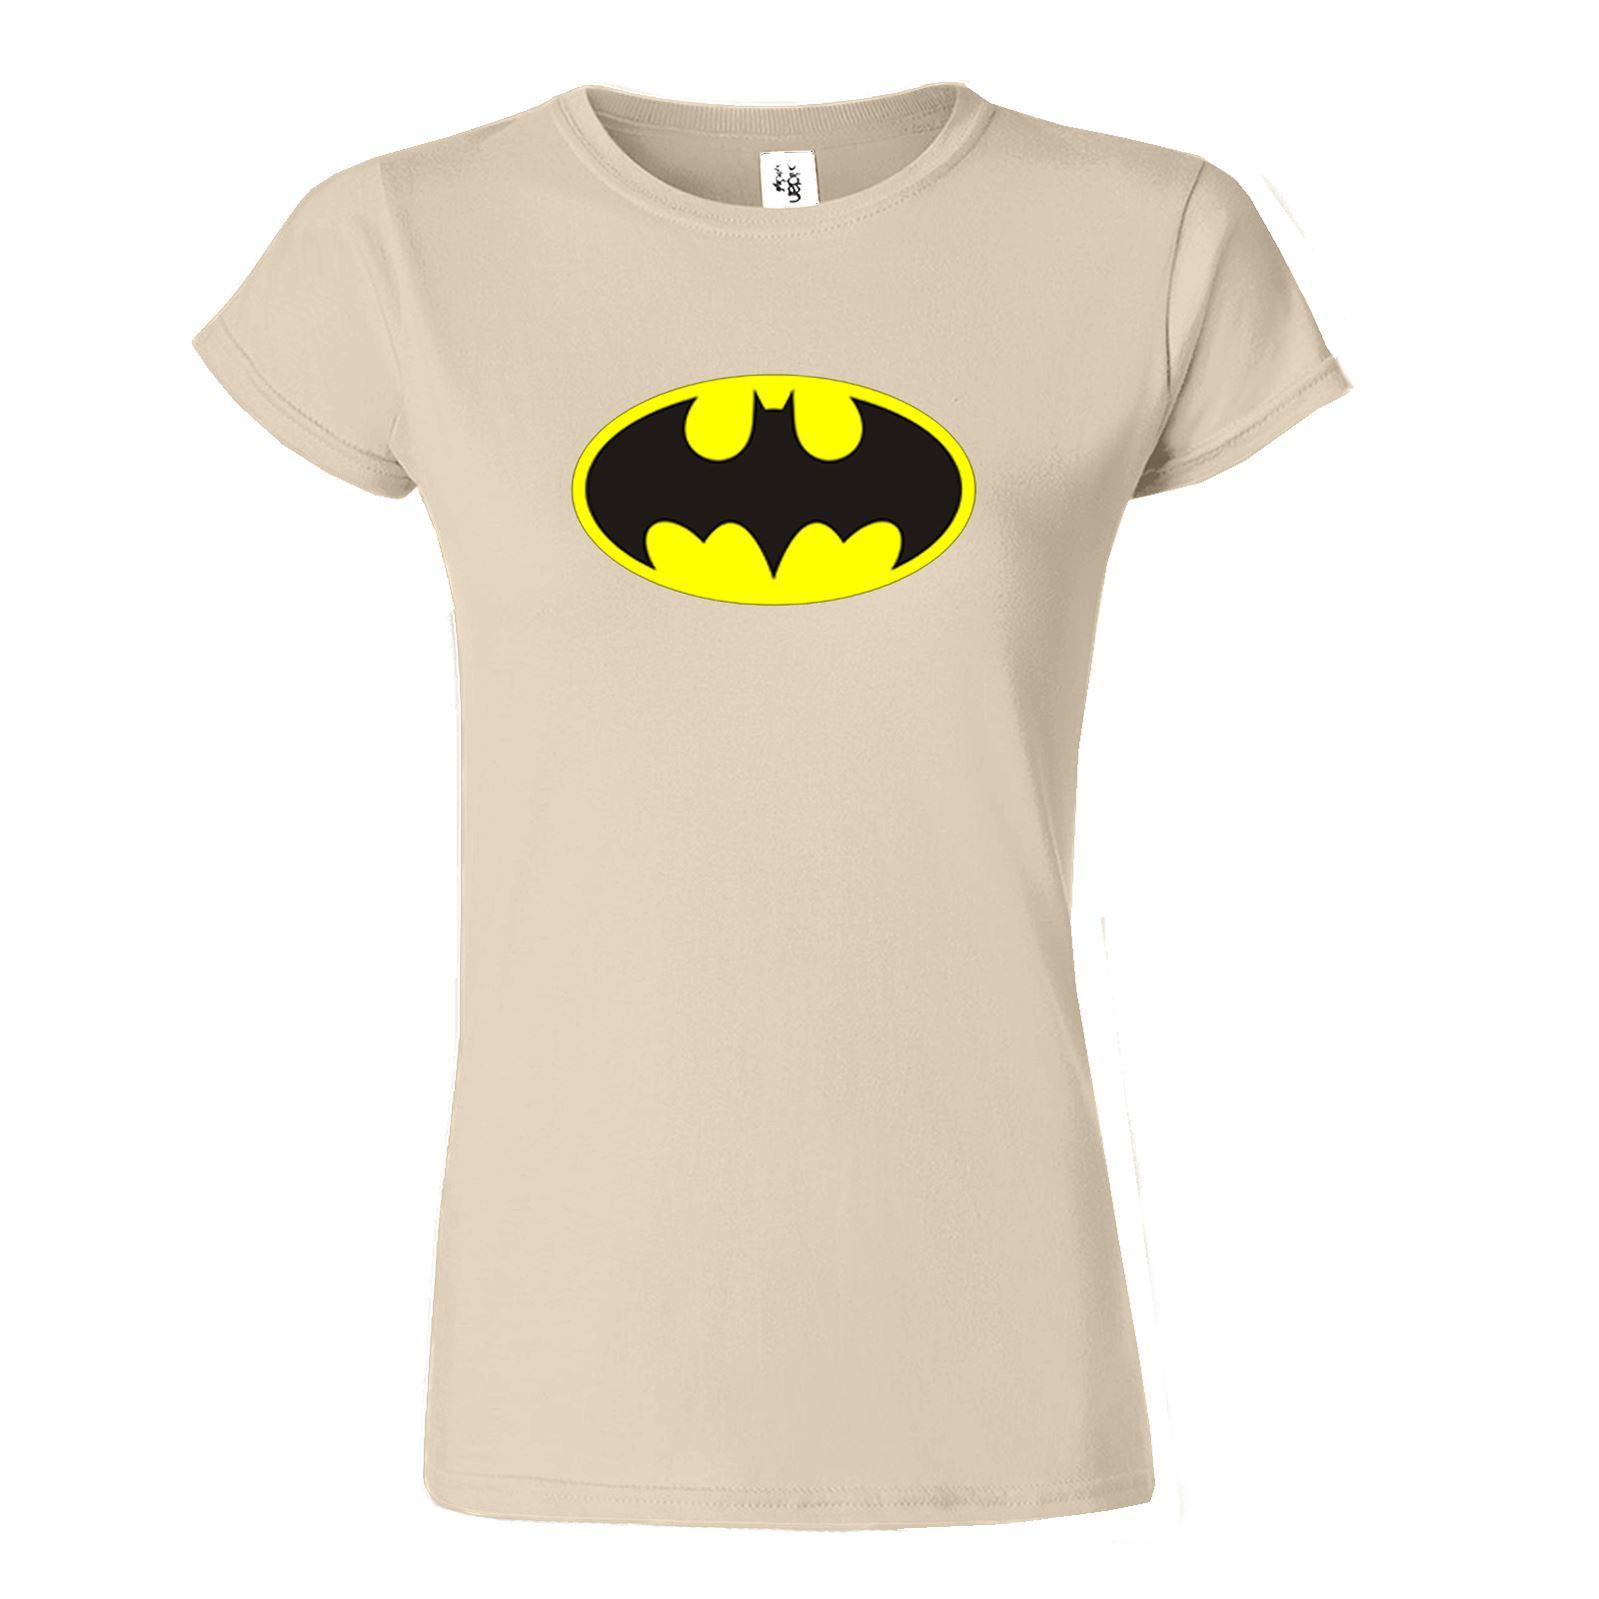 Womens Ladies Girls Fitted T Shirt Sweatshirt Cotton